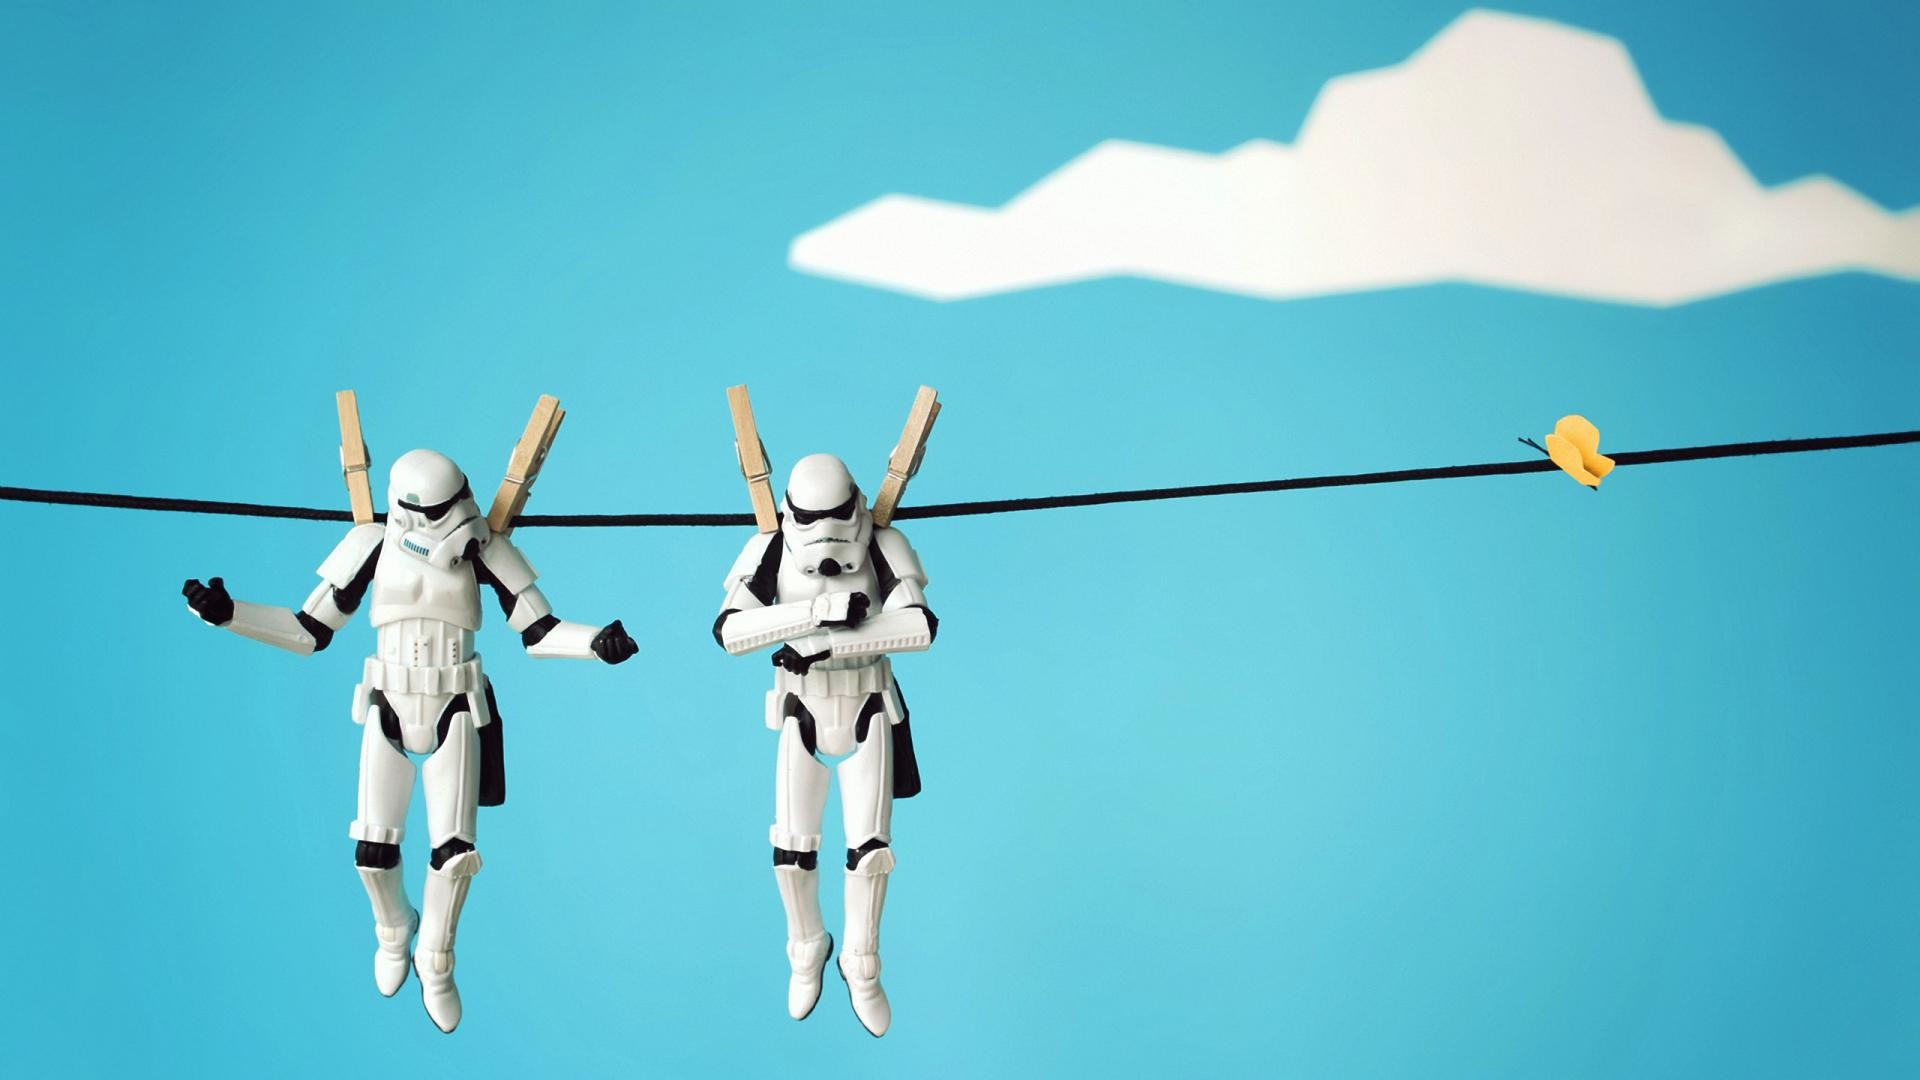 Funny Star Wars Lego HD Wallpaper   HD Wallpapers Source